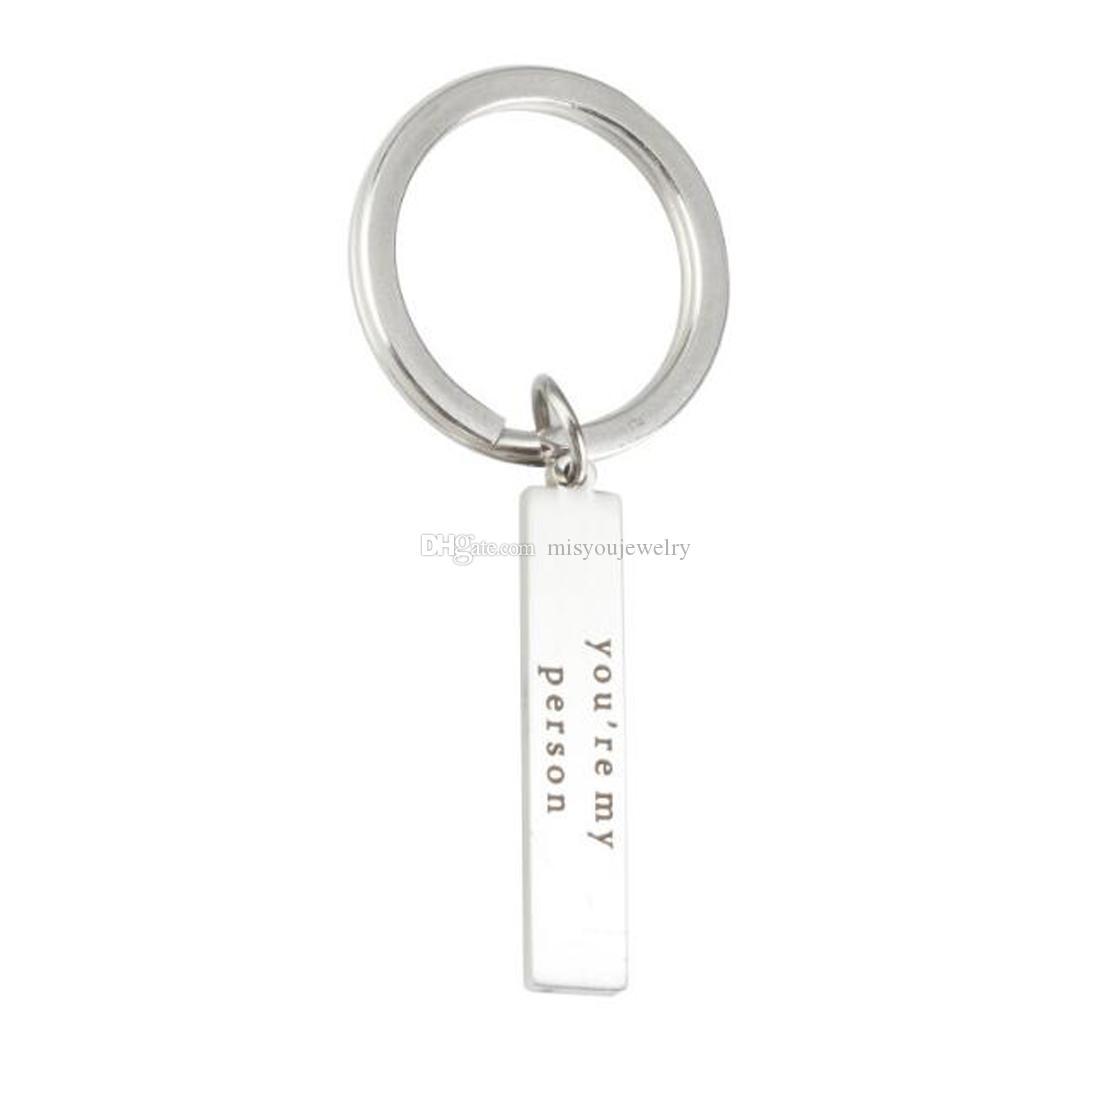 Fashion jewelry accessories fine You're My Person Stainless Steel Rectangle Keychain Keyring Best Friend Boyfriend Girlfriend